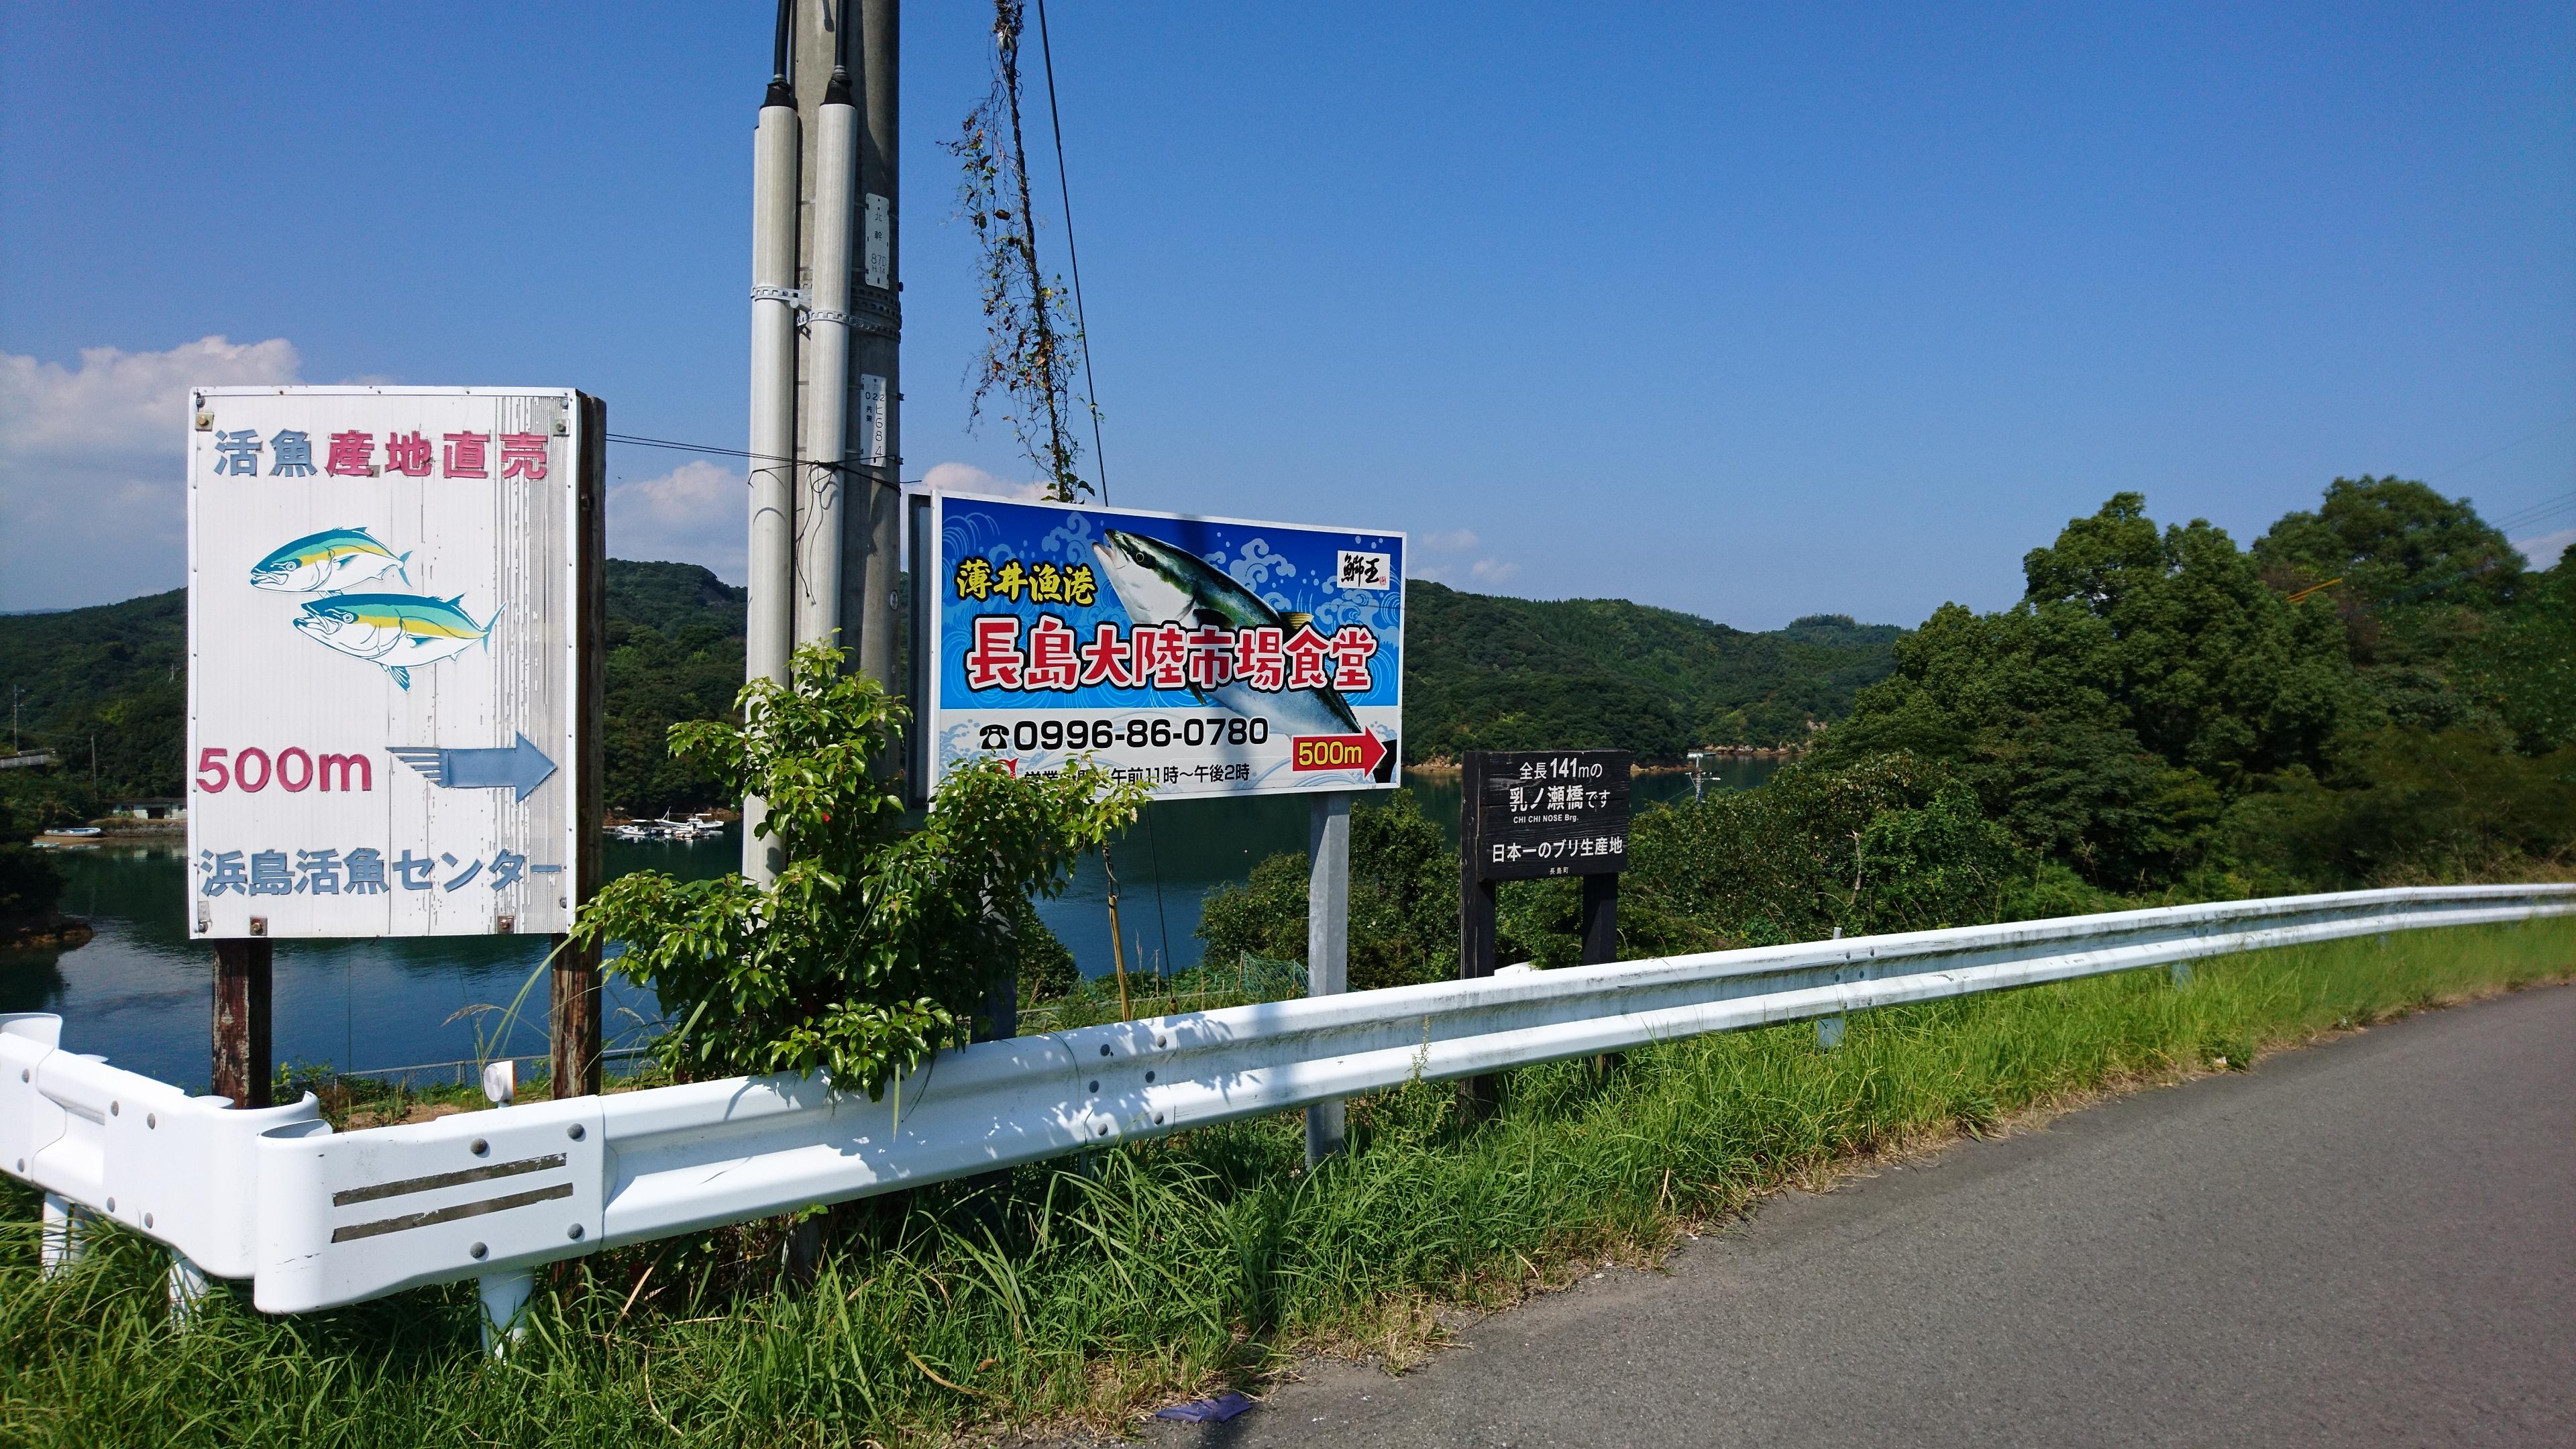 http://hashiguchi-seikotu.com/blog/about/%E6%A9%8B%E3%80%80%E5%8F%B3%E6%8A%98.JPG